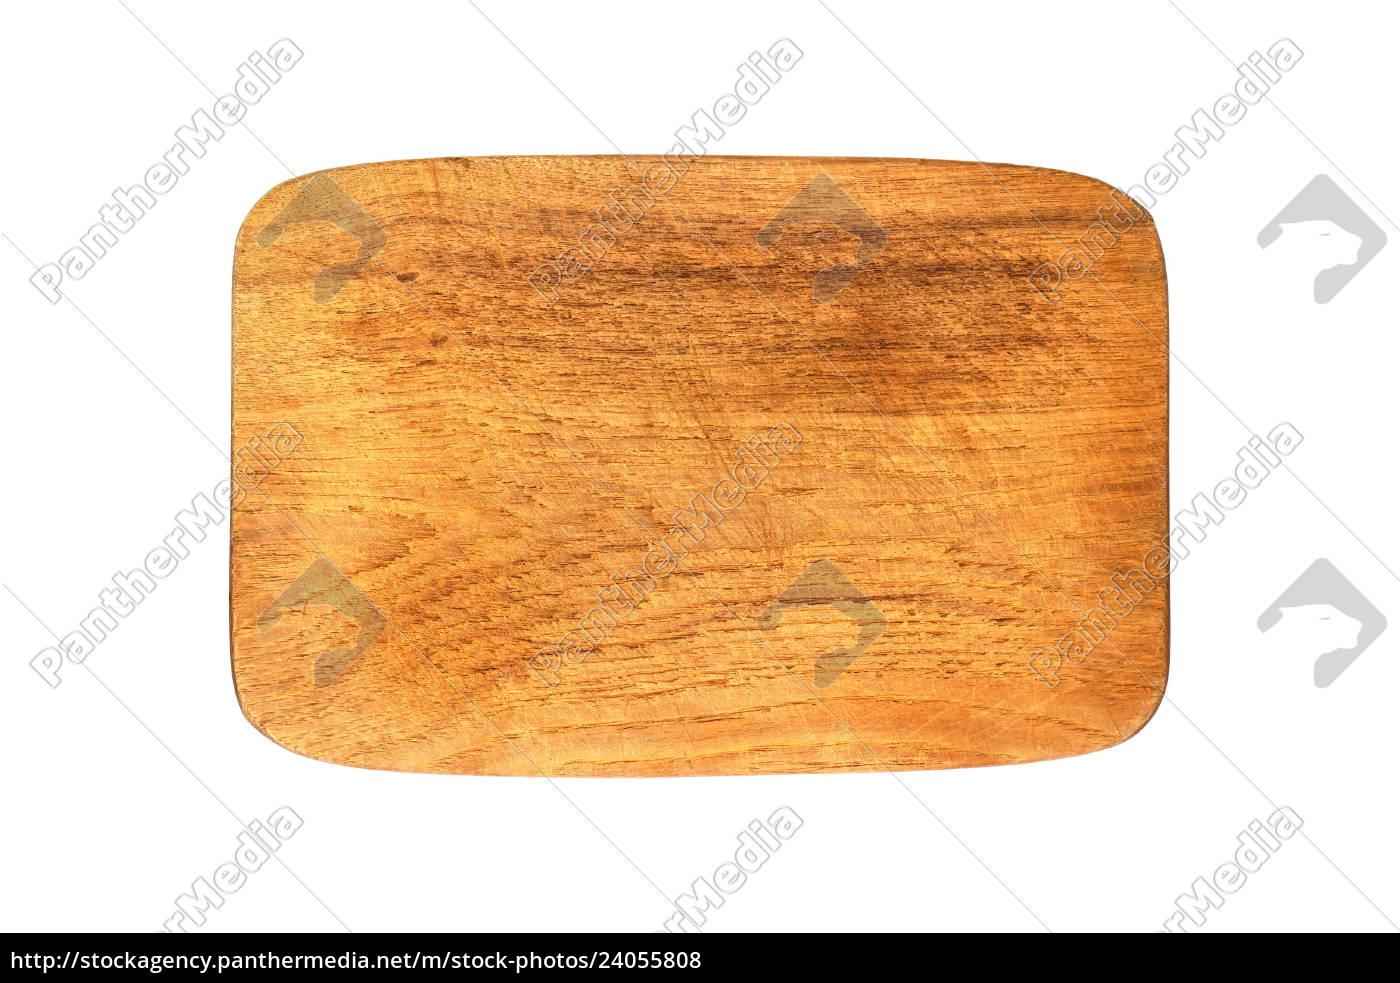 Isoliertes Frühstücksbrett aus Holz - Lizenzfreies Foto - #24055808 ...